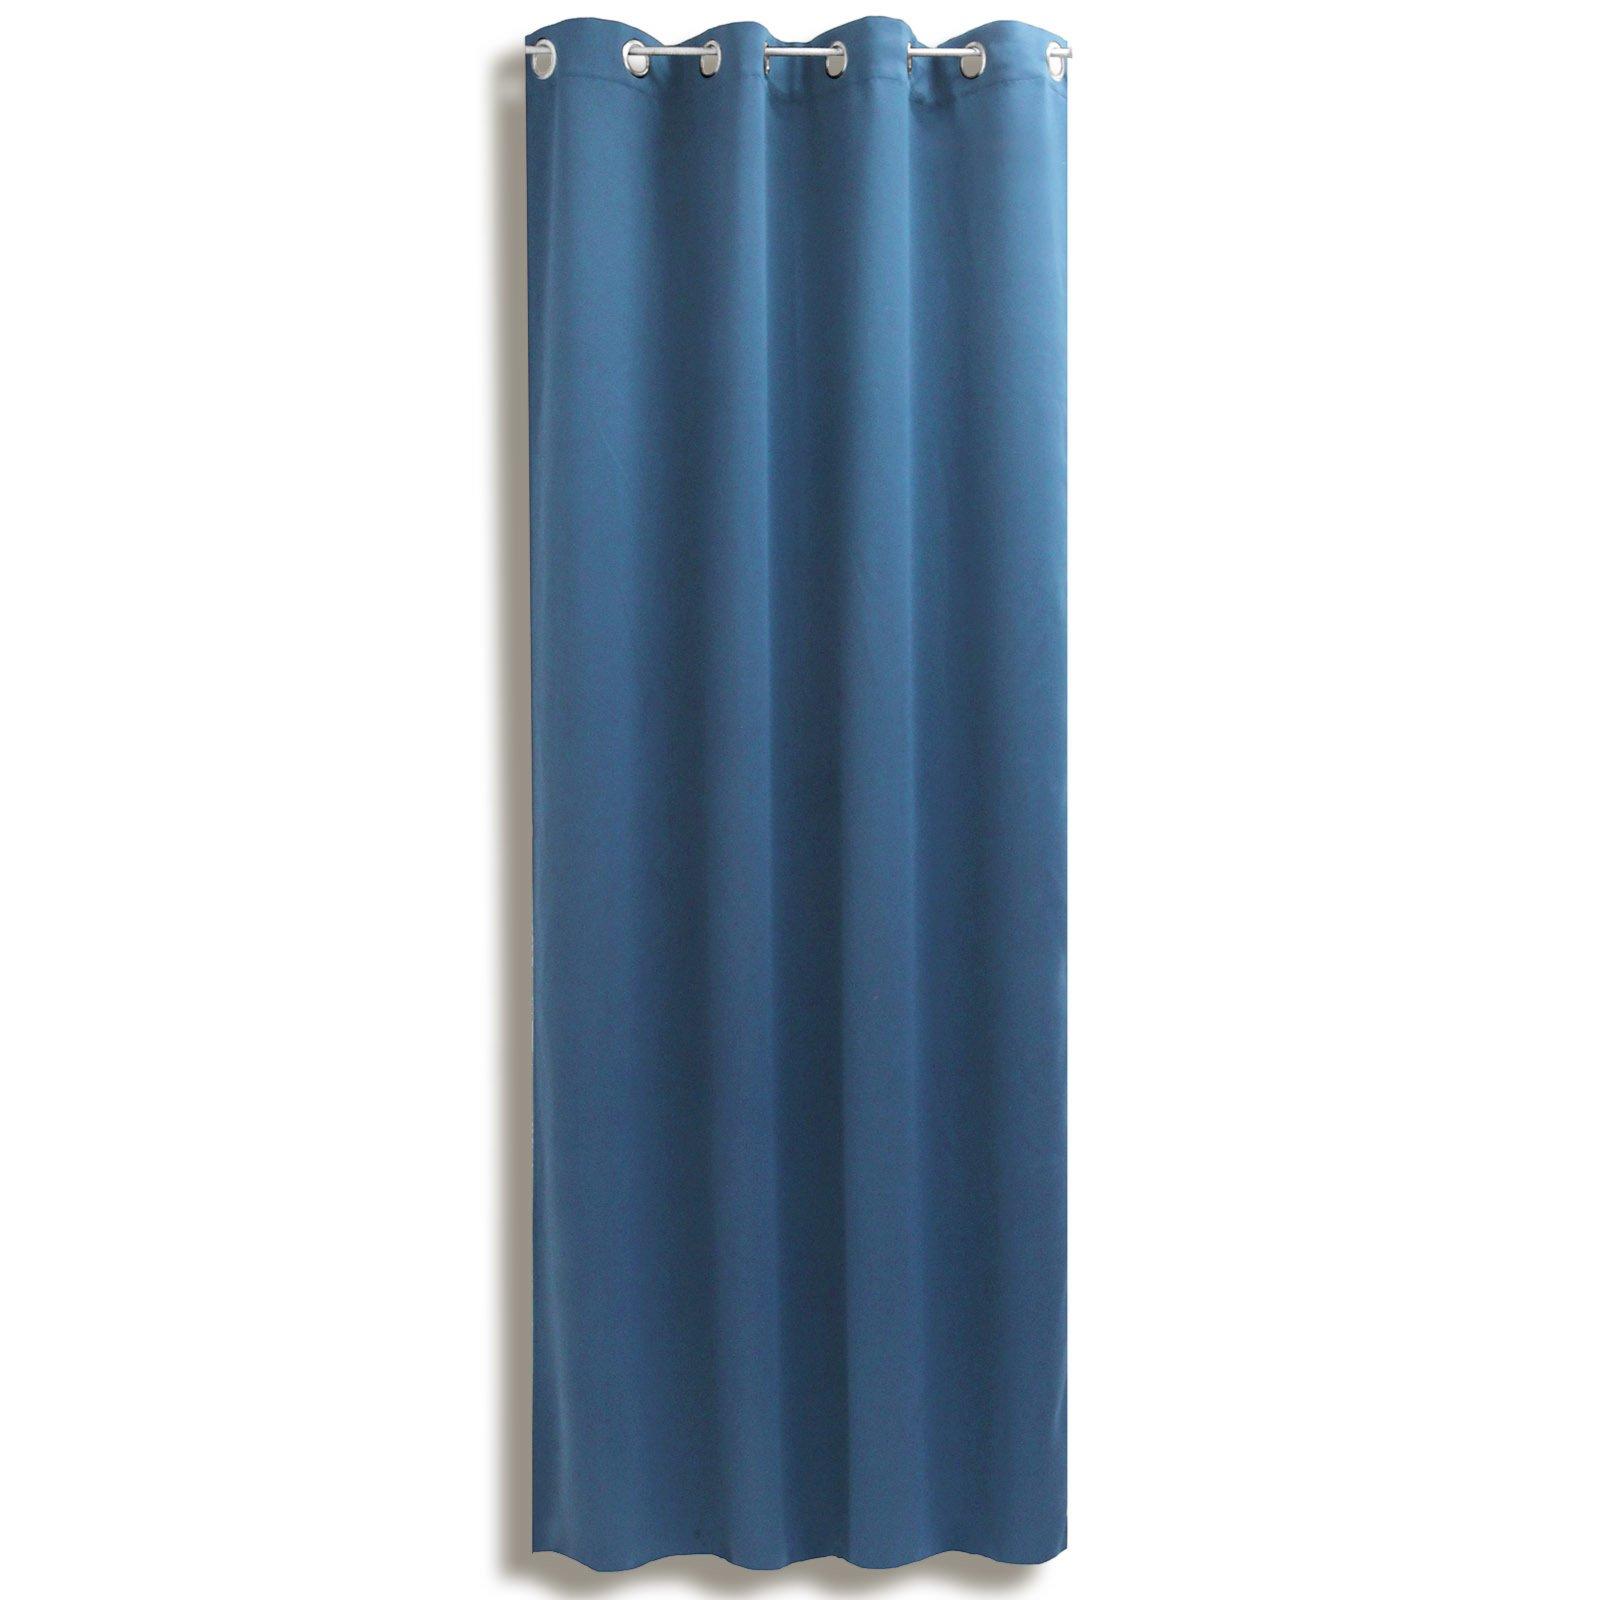 Verdunklungsvorhang LANOS - petrol - 140x175 cm